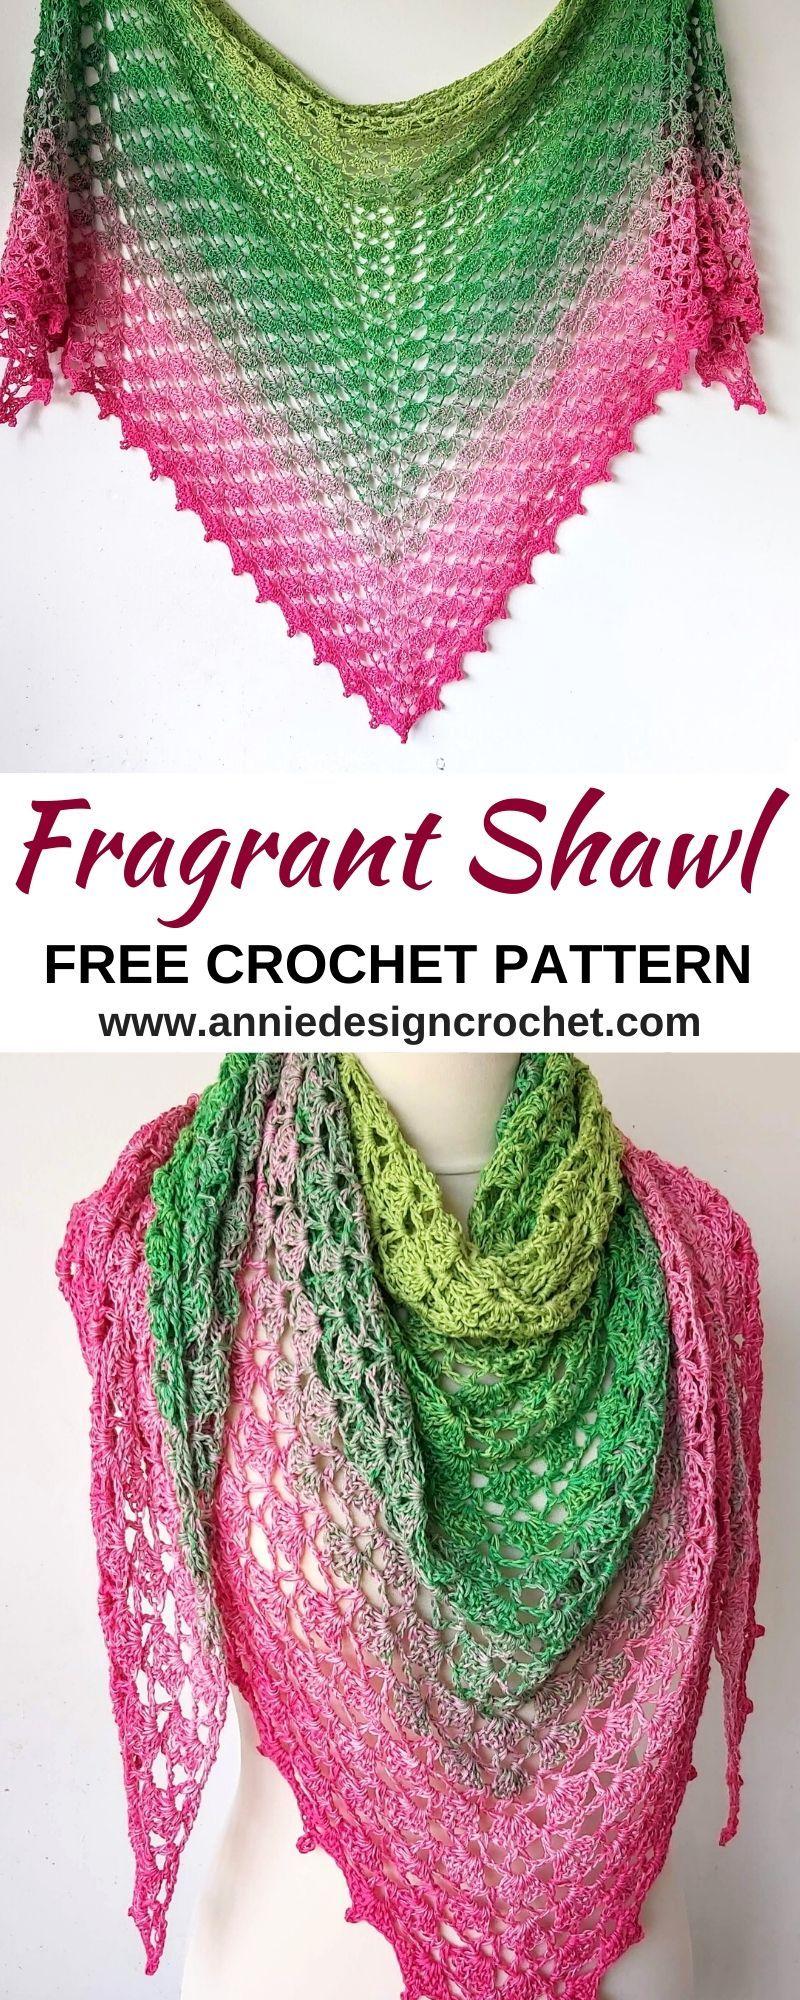 Crochet Shawl with Shells Pattern